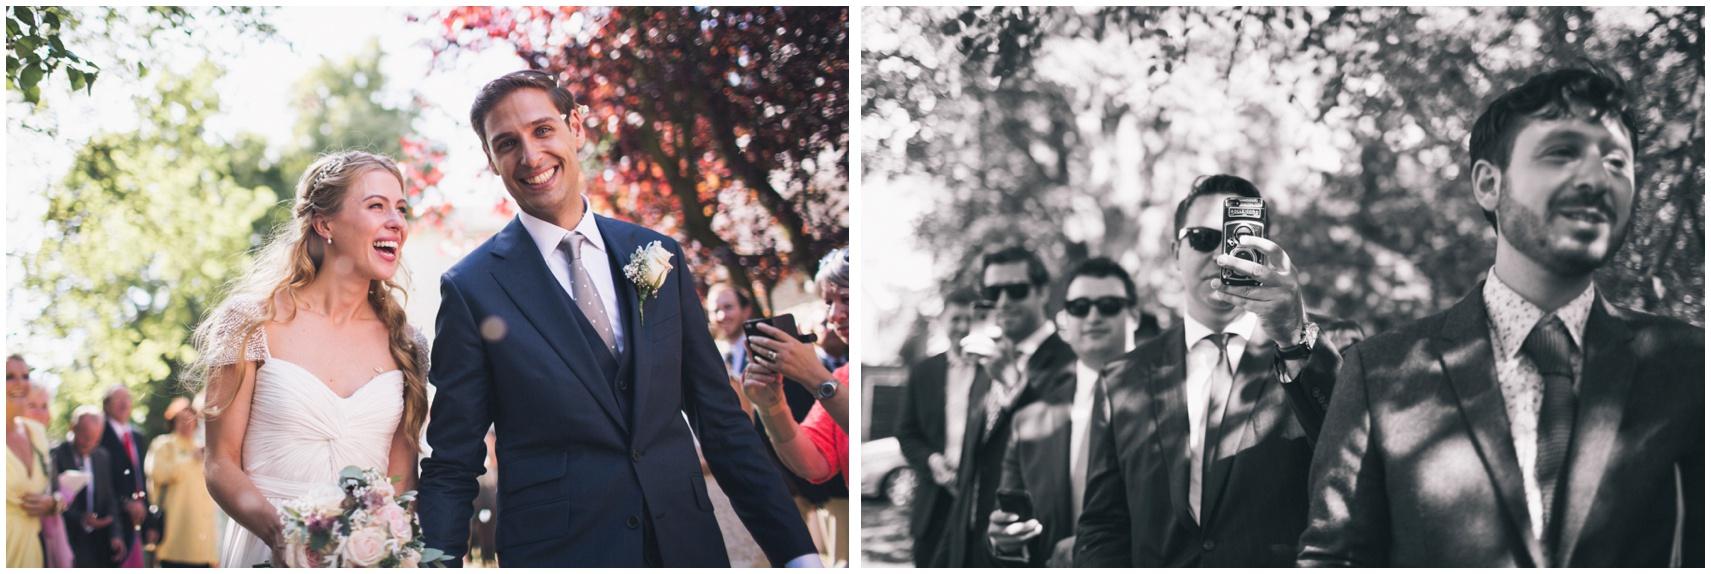 BMC Wedding photography Rutland_0298.jpg